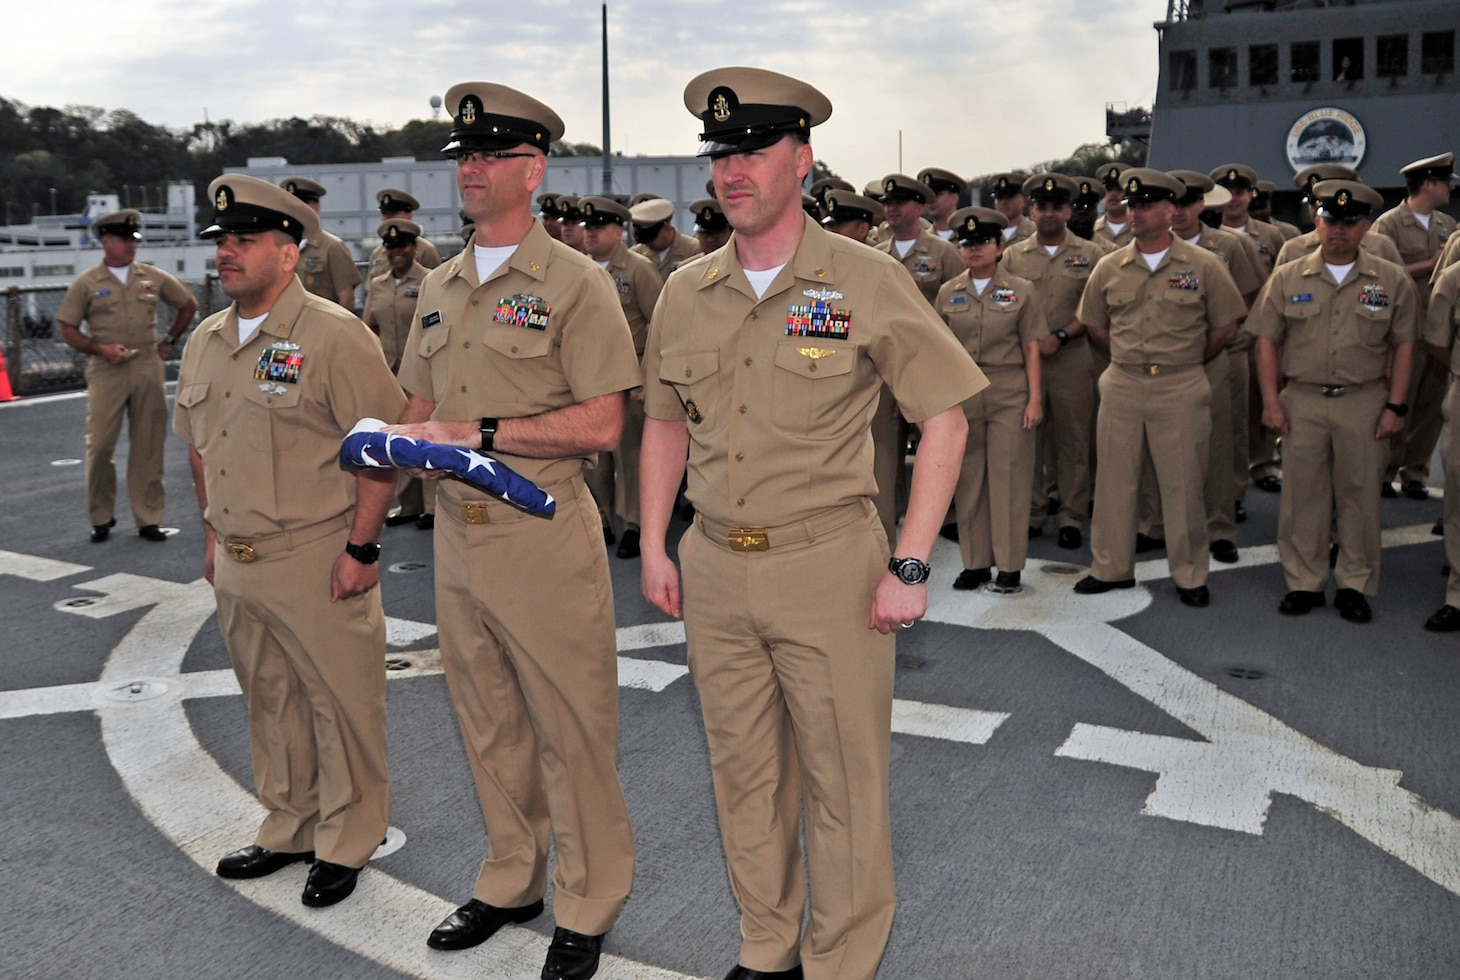 USS Blue Ridge, C7F Chiefs Celebrate 125th CPO birthday